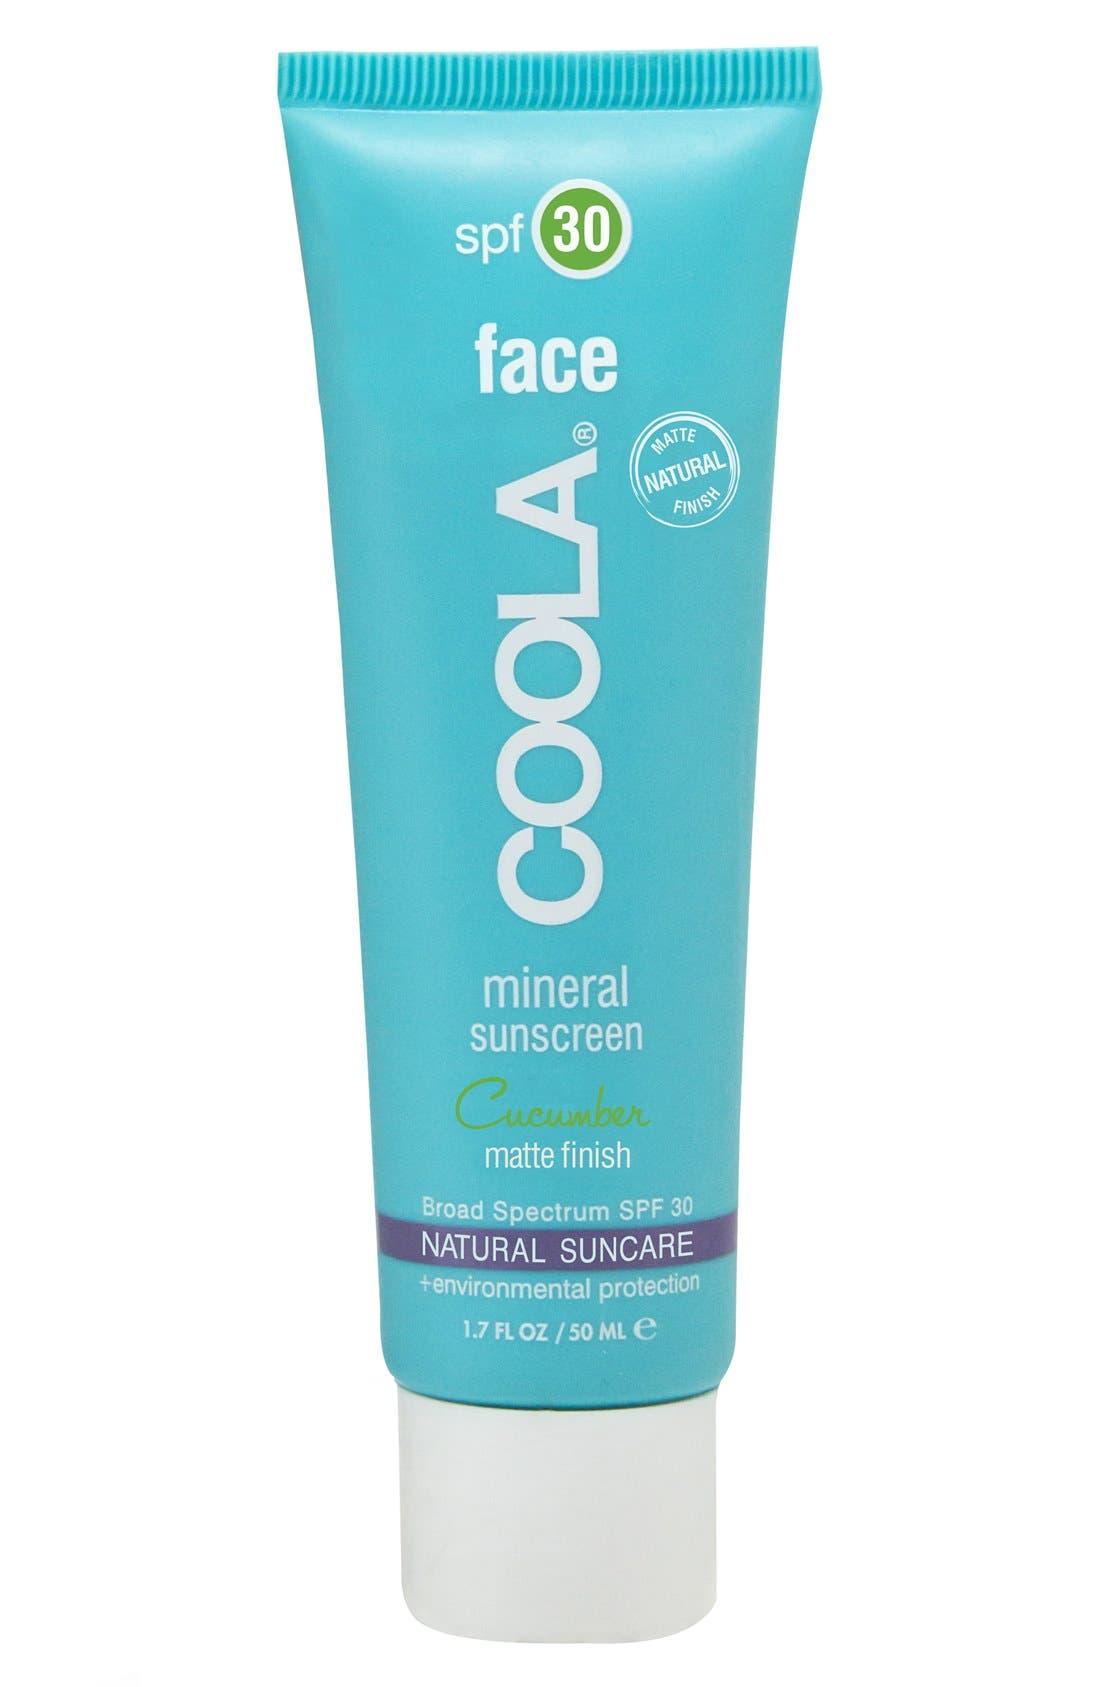 Coola Suncare Cucumber Face Mineral Sunscreen Spf 30